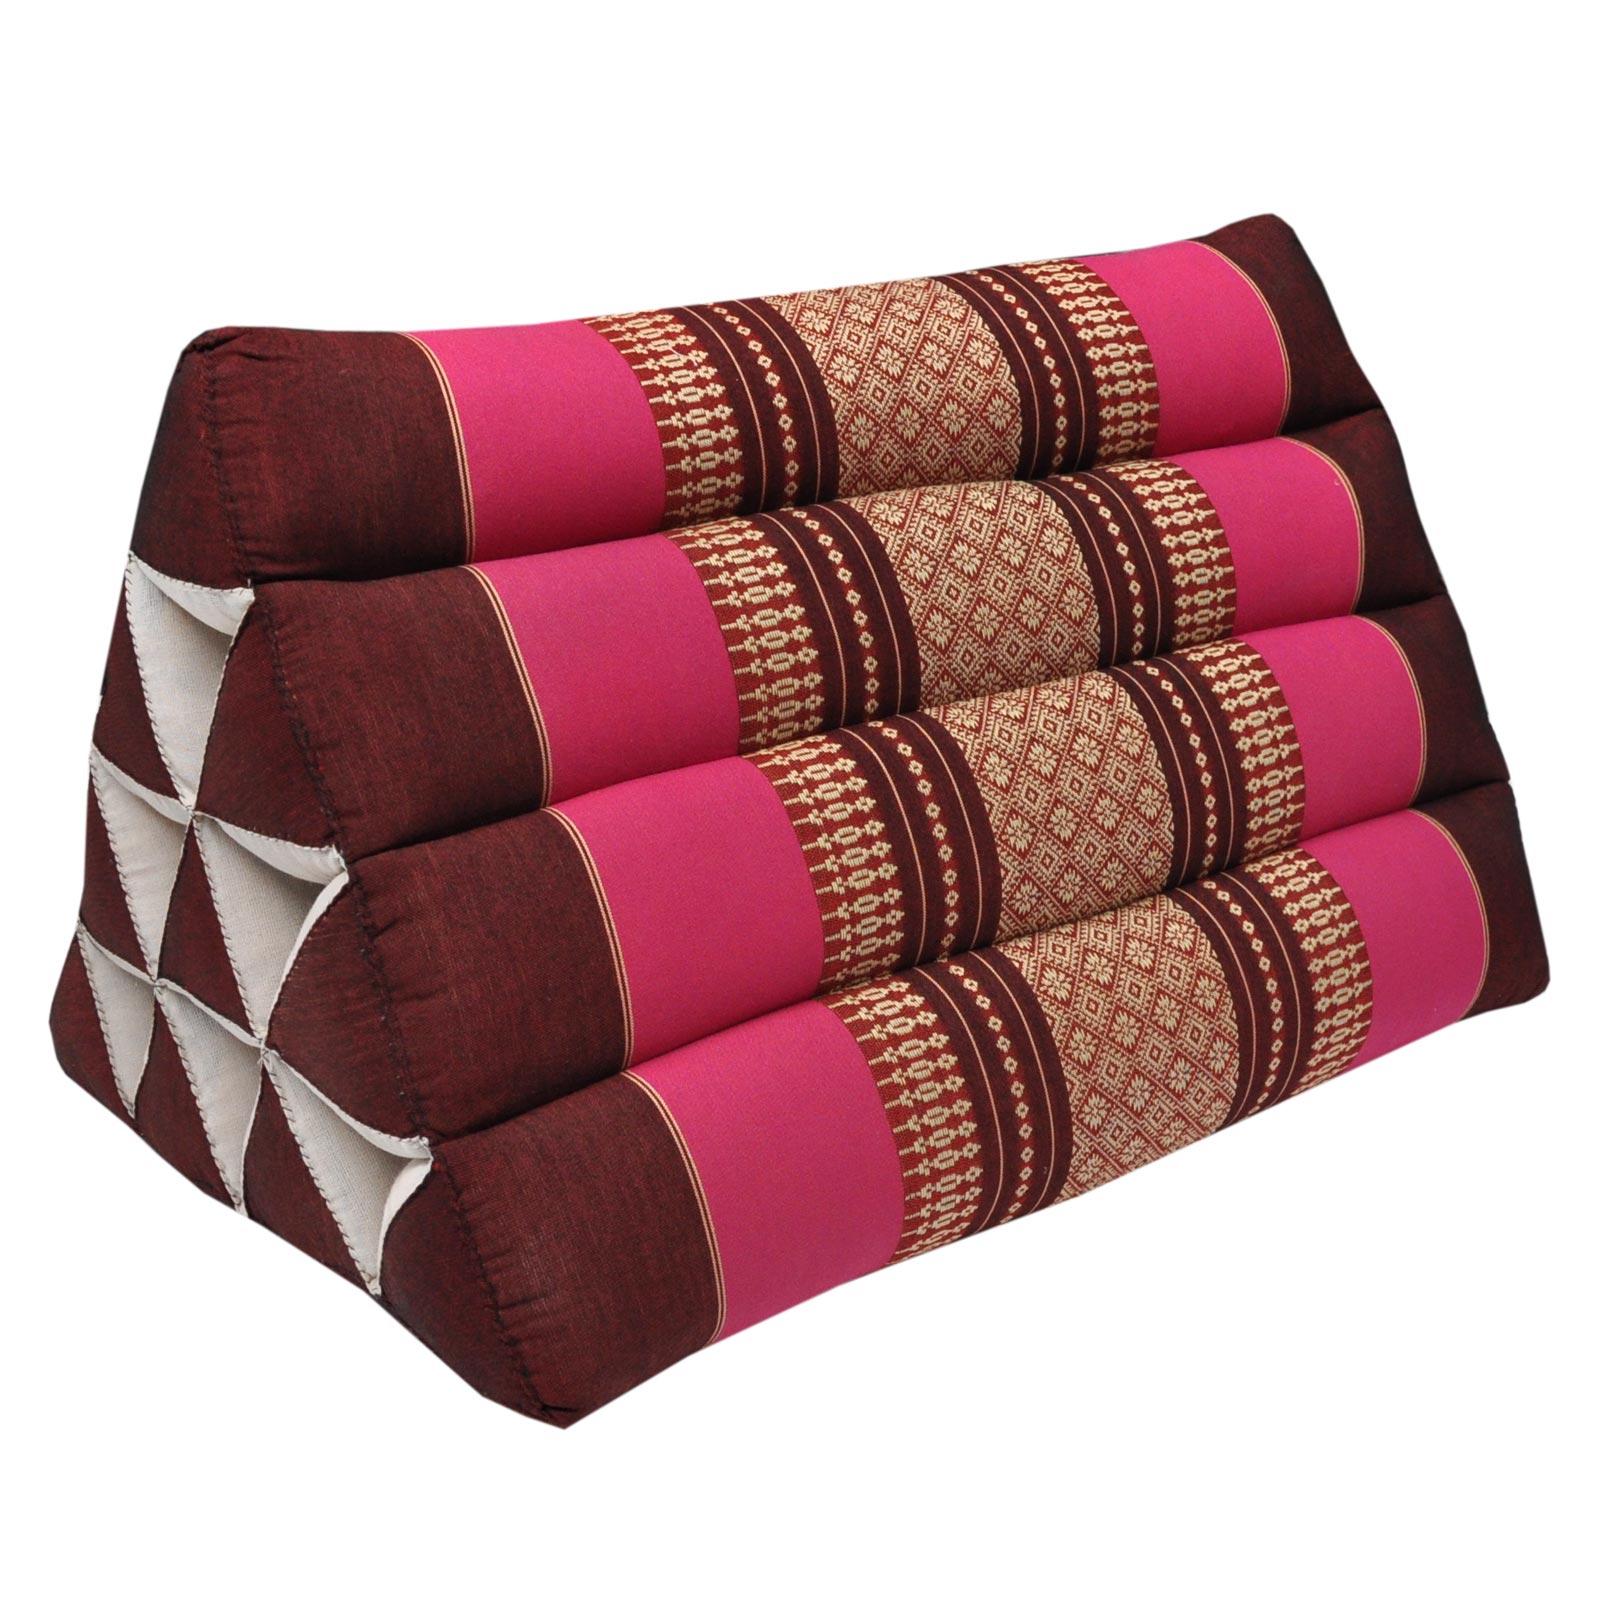 coussins tha landais matelas tapis canap m ditation traversin 814 ebay. Black Bedroom Furniture Sets. Home Design Ideas